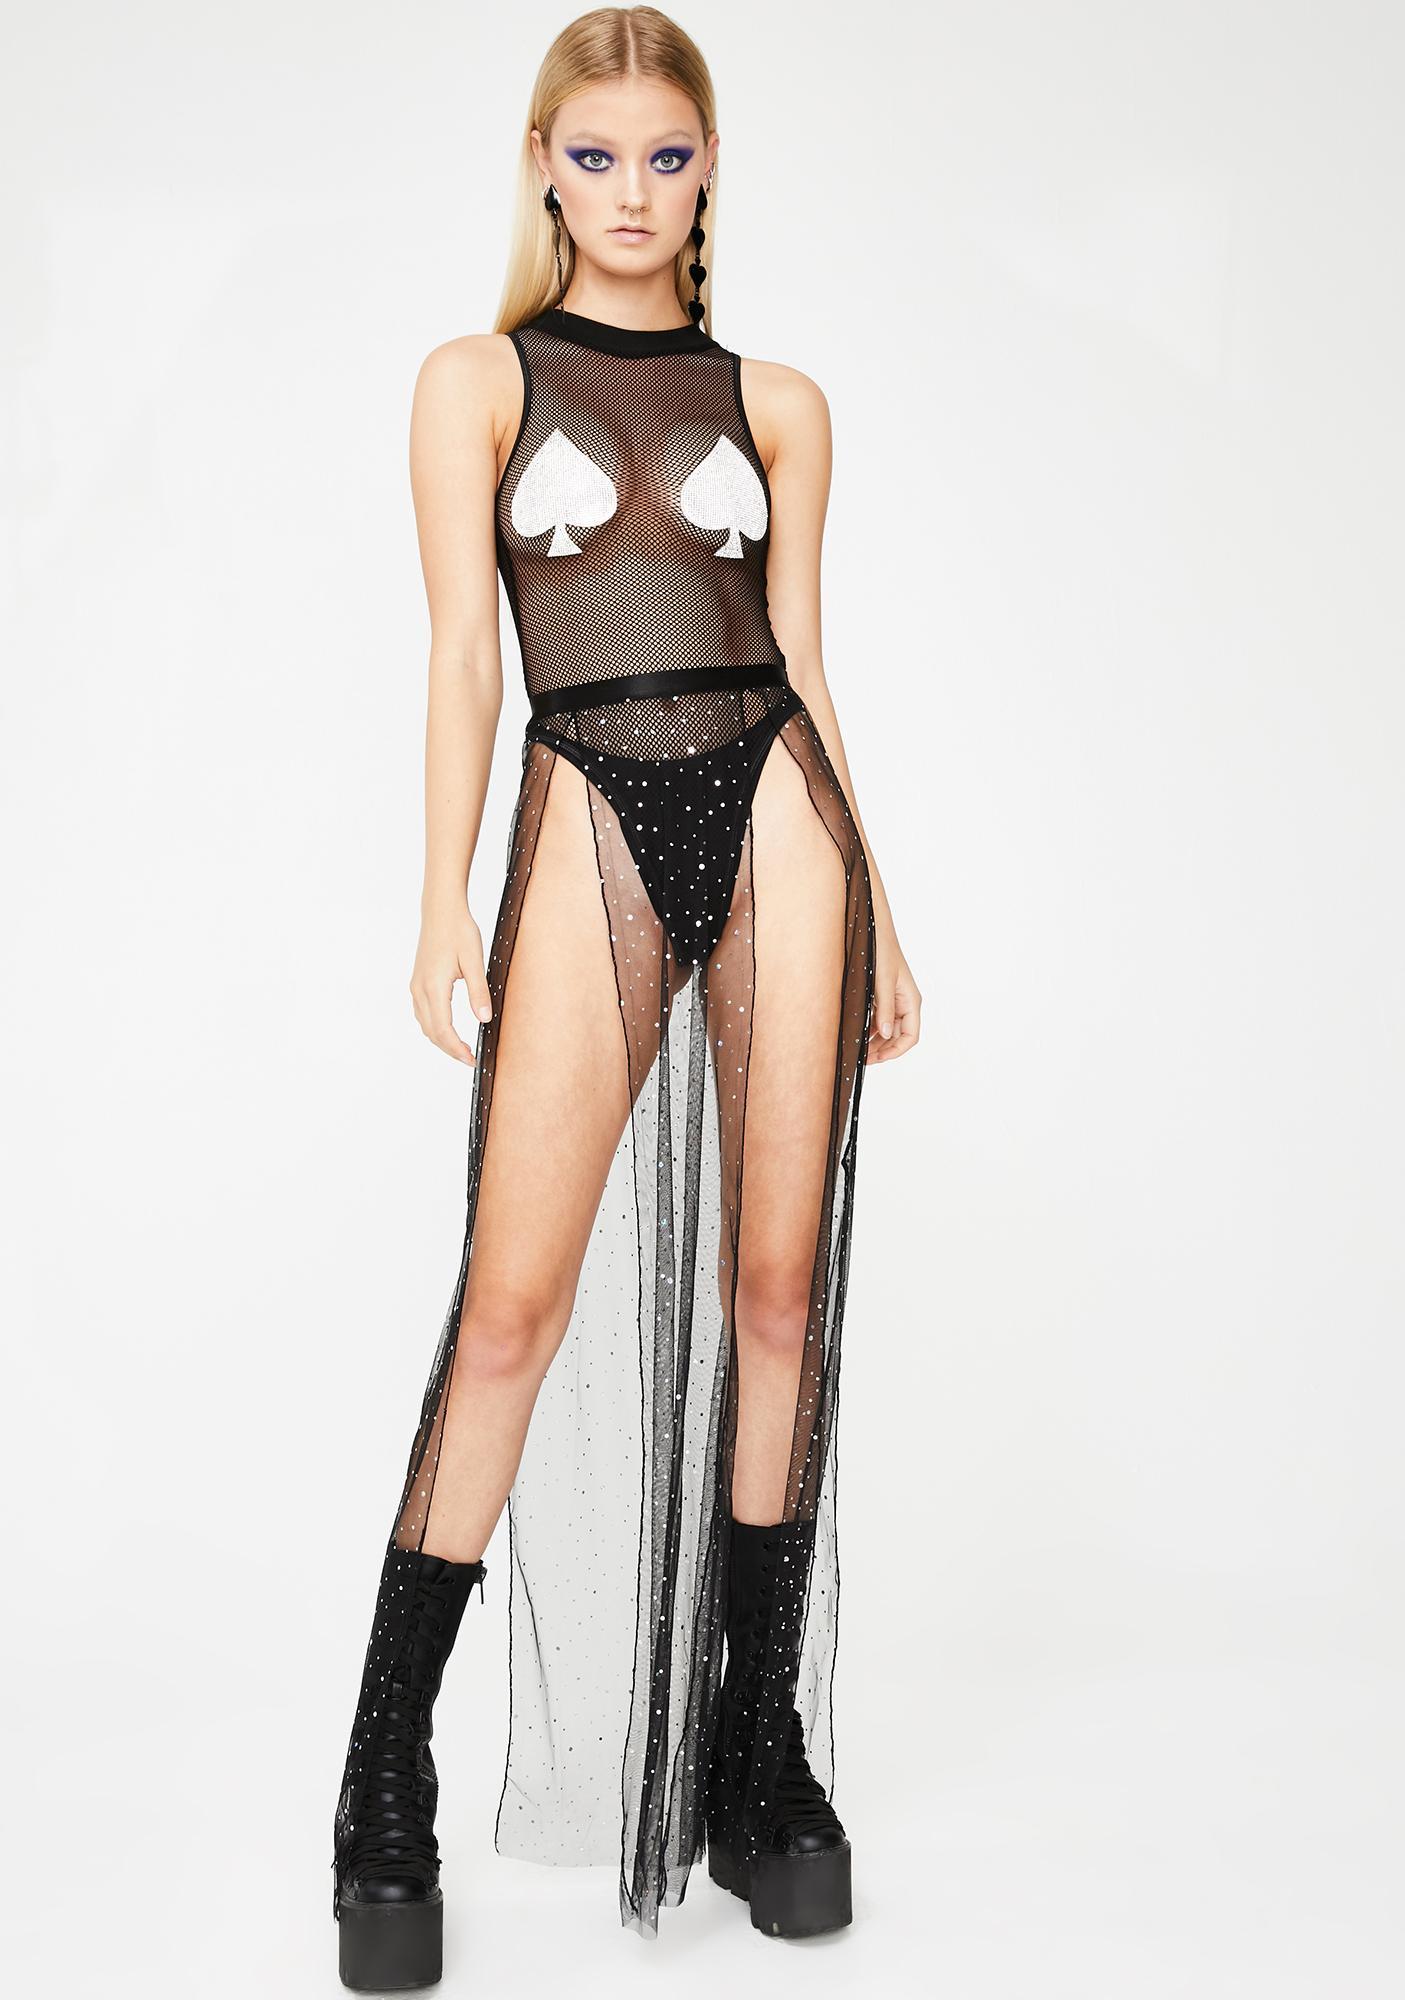 Club Exx Ace Of Spades Fishnet Bodysuit